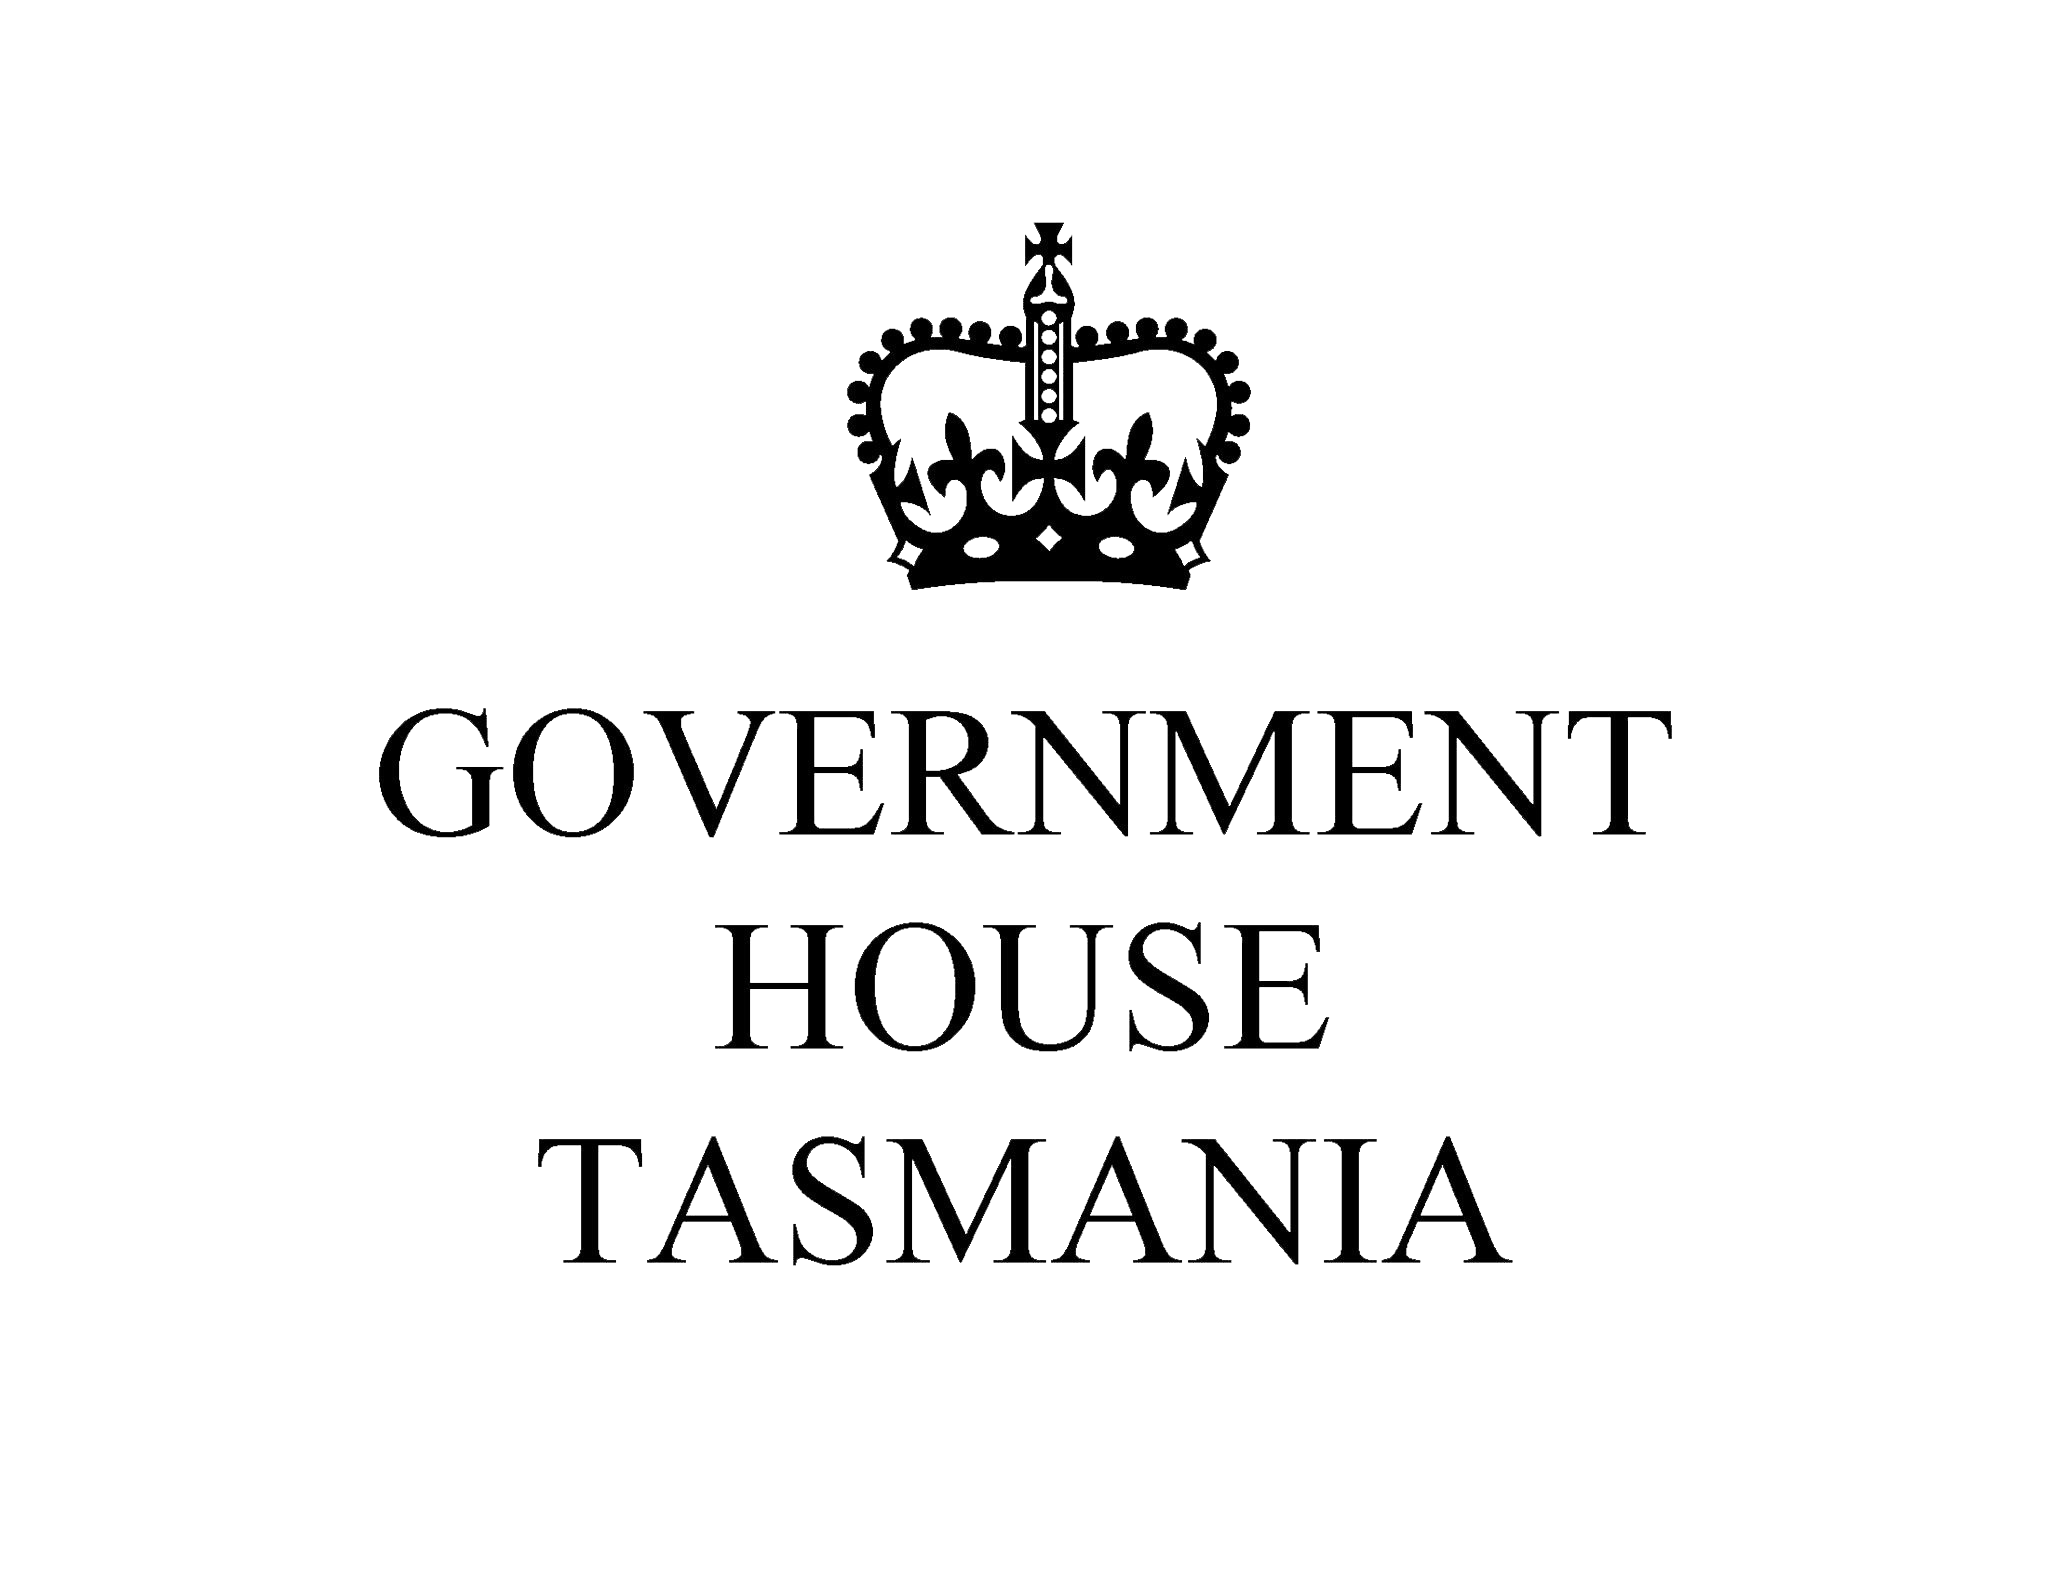 government house tasmania.png